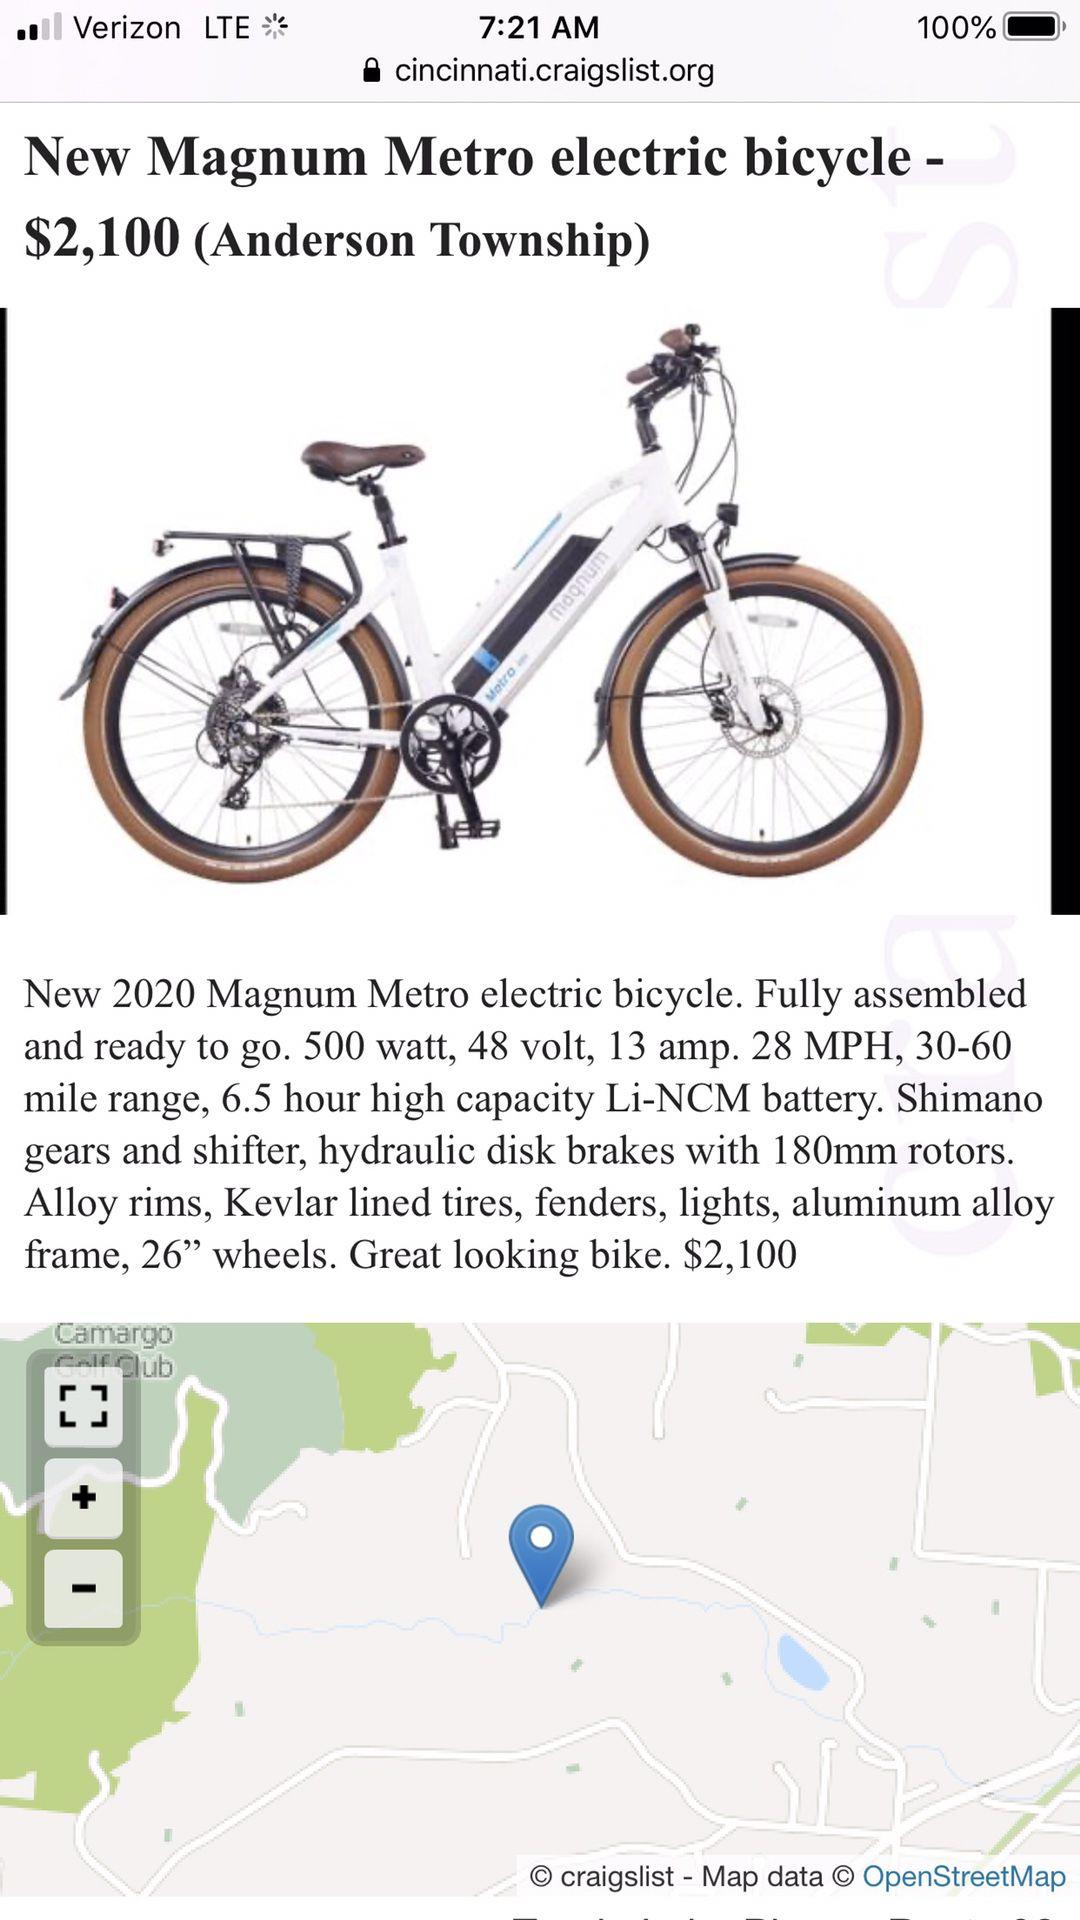 Used Electric Bikes Craigslist : electric, bikes, craigslist, Craigslist, Electric